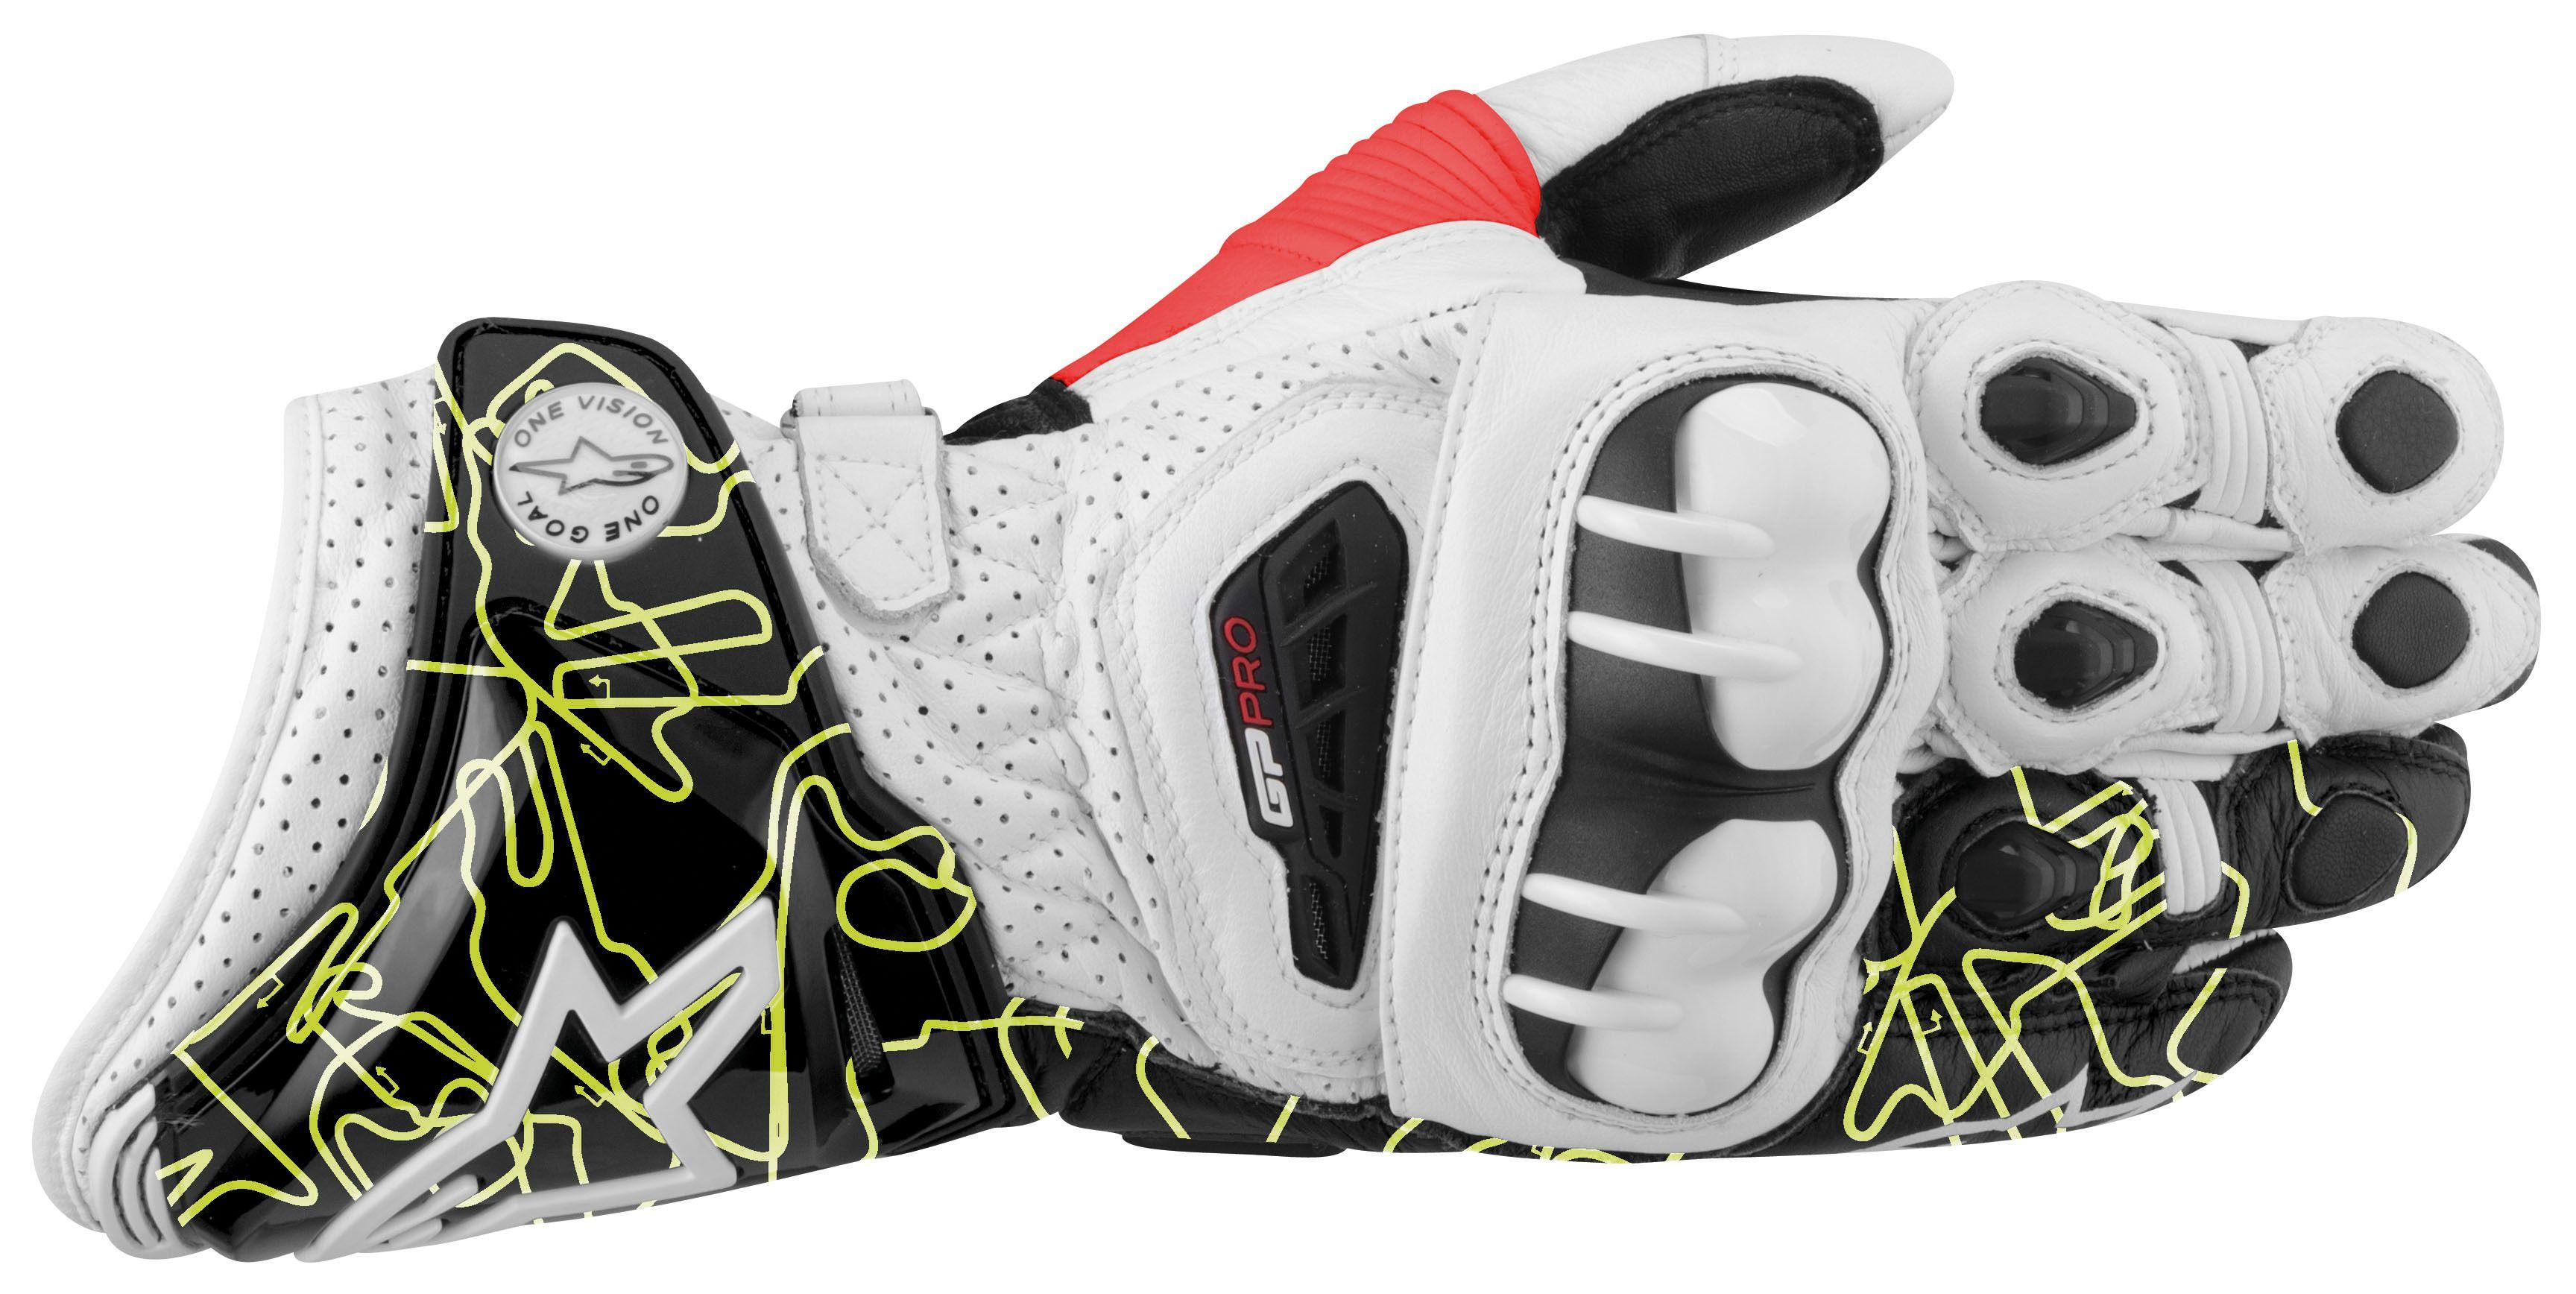 Motorcycle gloves external seams - Motorcycle Gloves External Seams 27